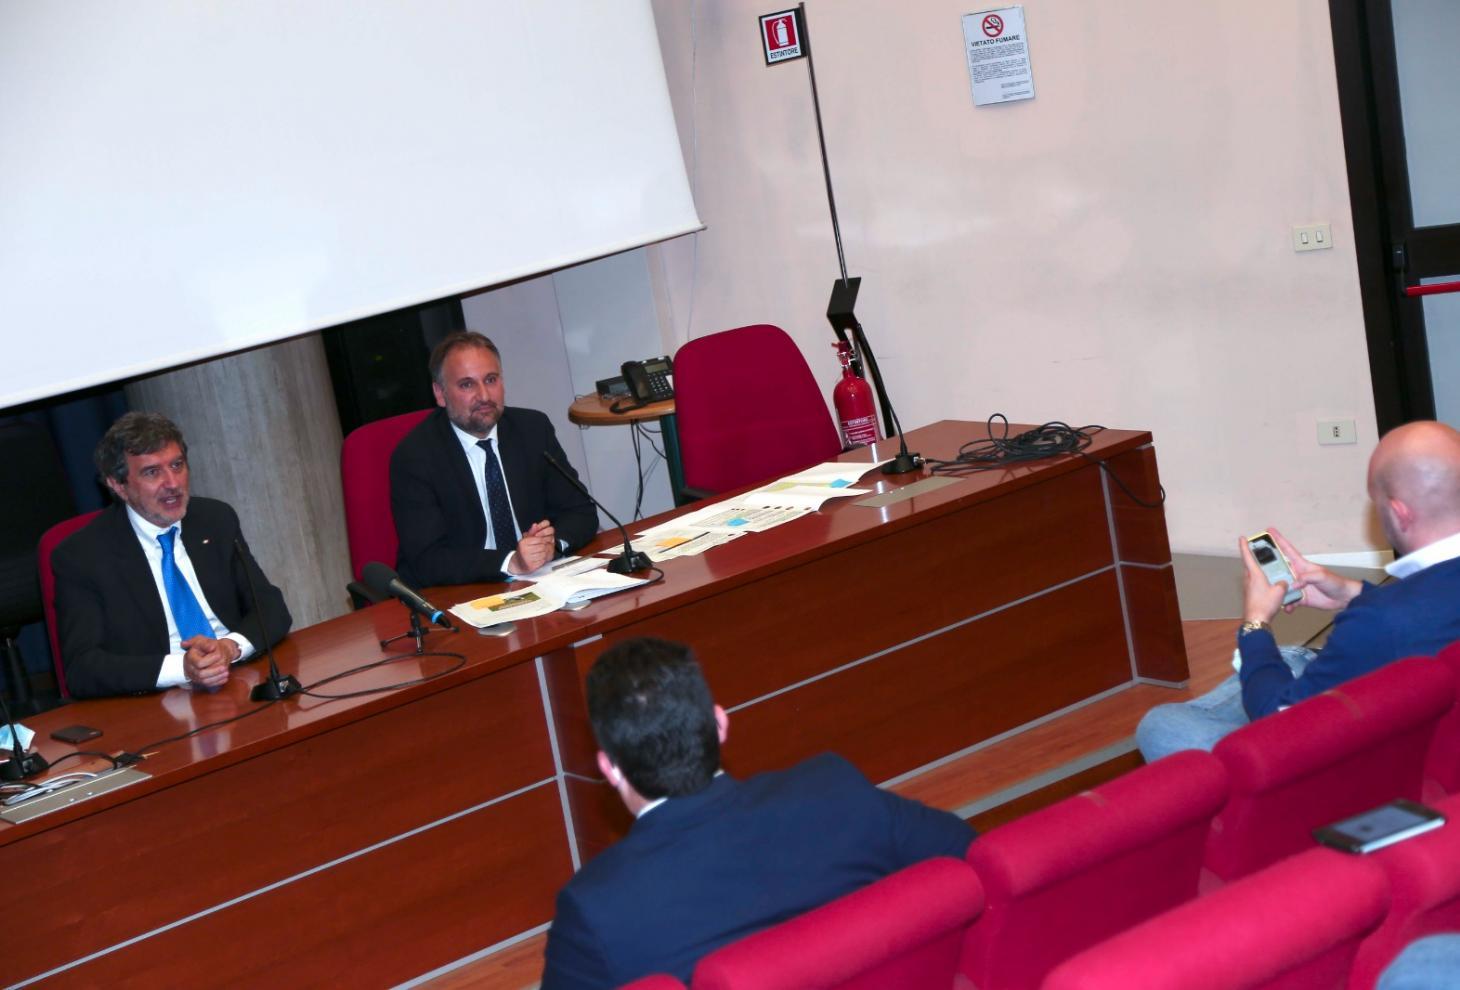 Marco Marsilio , Guido Quintino Liris